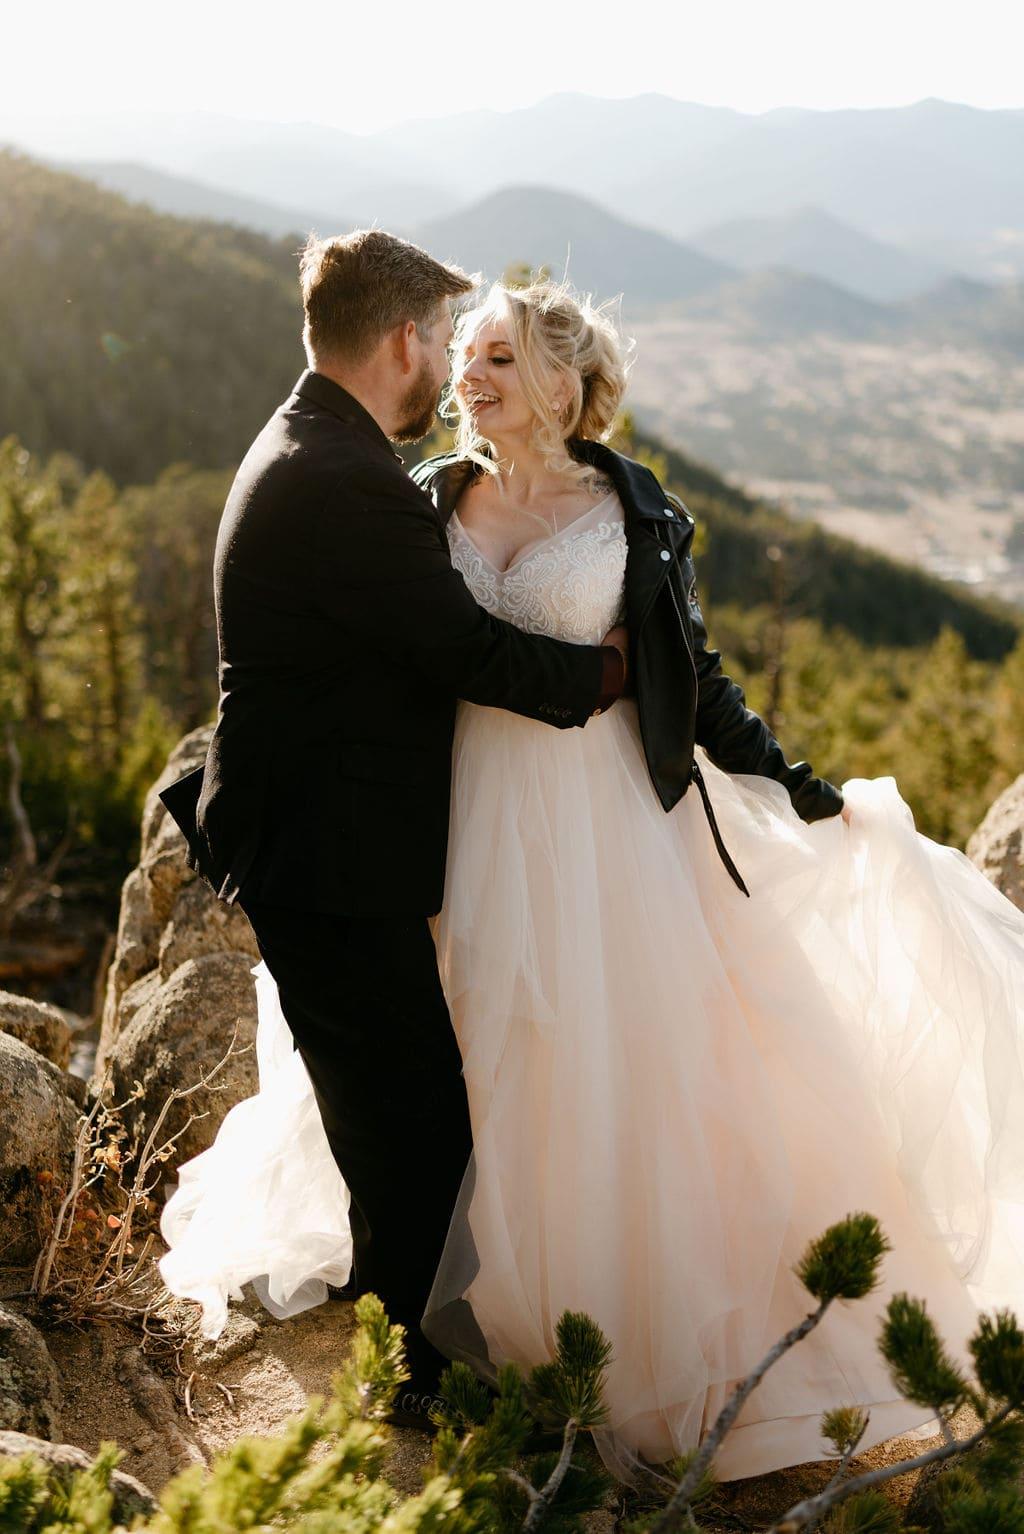 Hermit Park Elopement Bride and Groom Golden Hour Wedding Portraits Estes Park